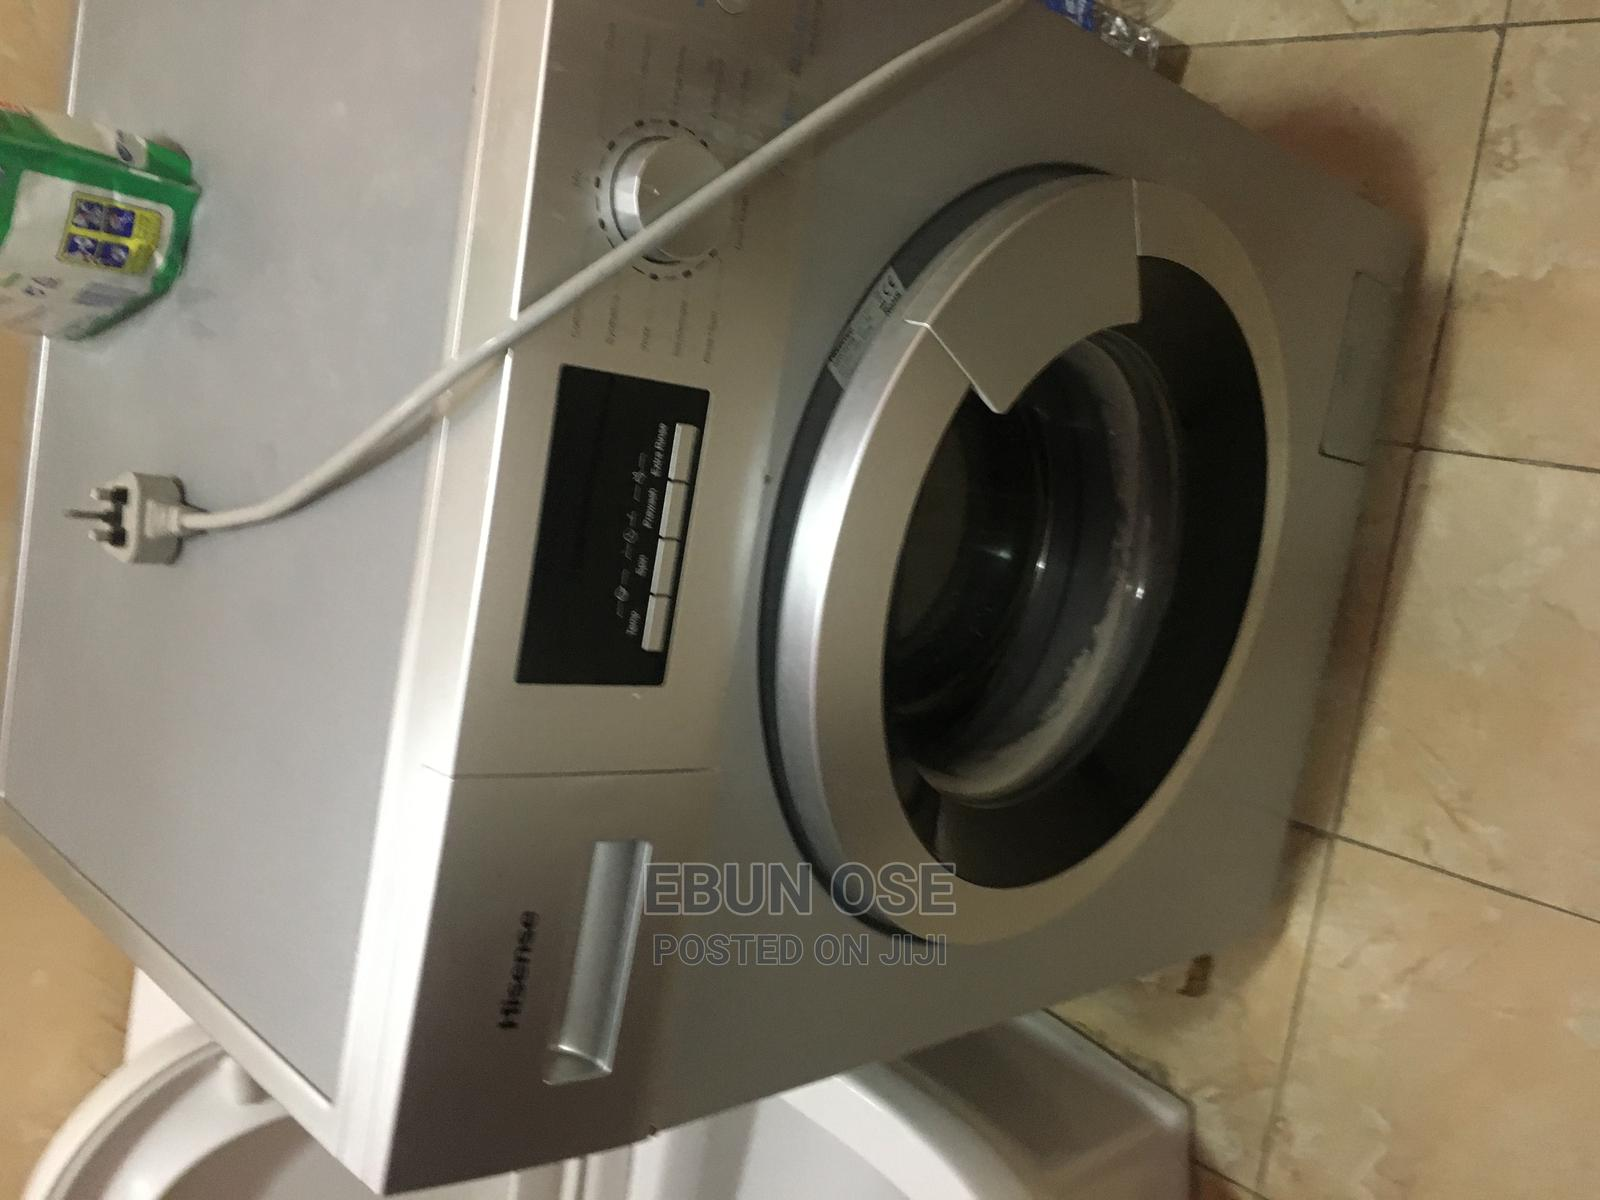 Hisense Washing Machine 7kg | Home Appliances for sale in Lekki, Lagos State, Nigeria